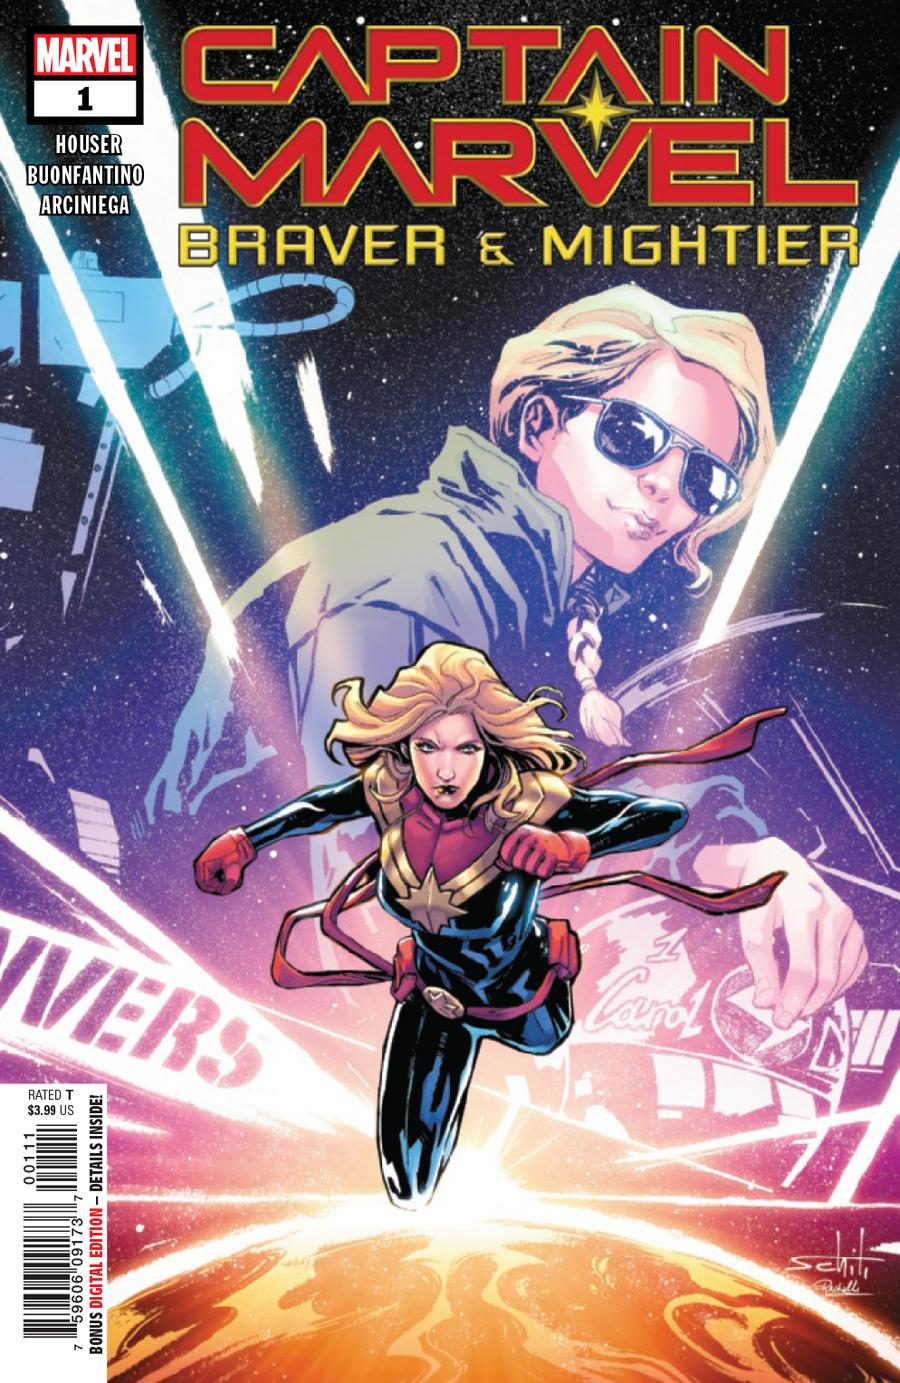 Captain Marvel Braver & Mightier #1 Cover A Regular Valerio Schiti Cover